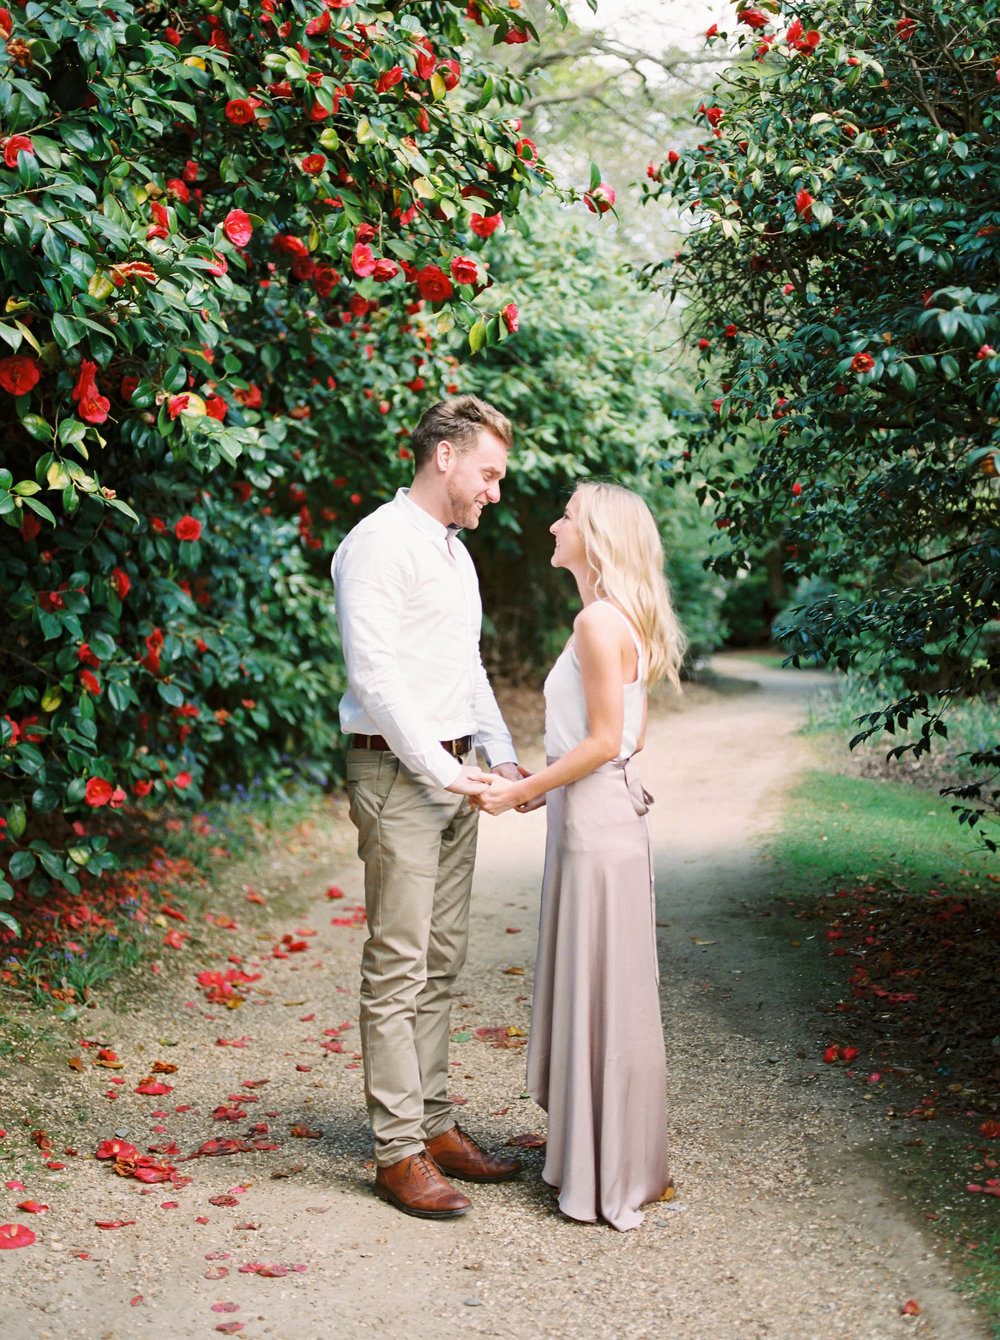 Amy O'Boyle Photography- Destination & UK Fine Art Film Wedding Photographer- Sheffield Park Garden National Trust Spring Engagement Shoot-1.jpg